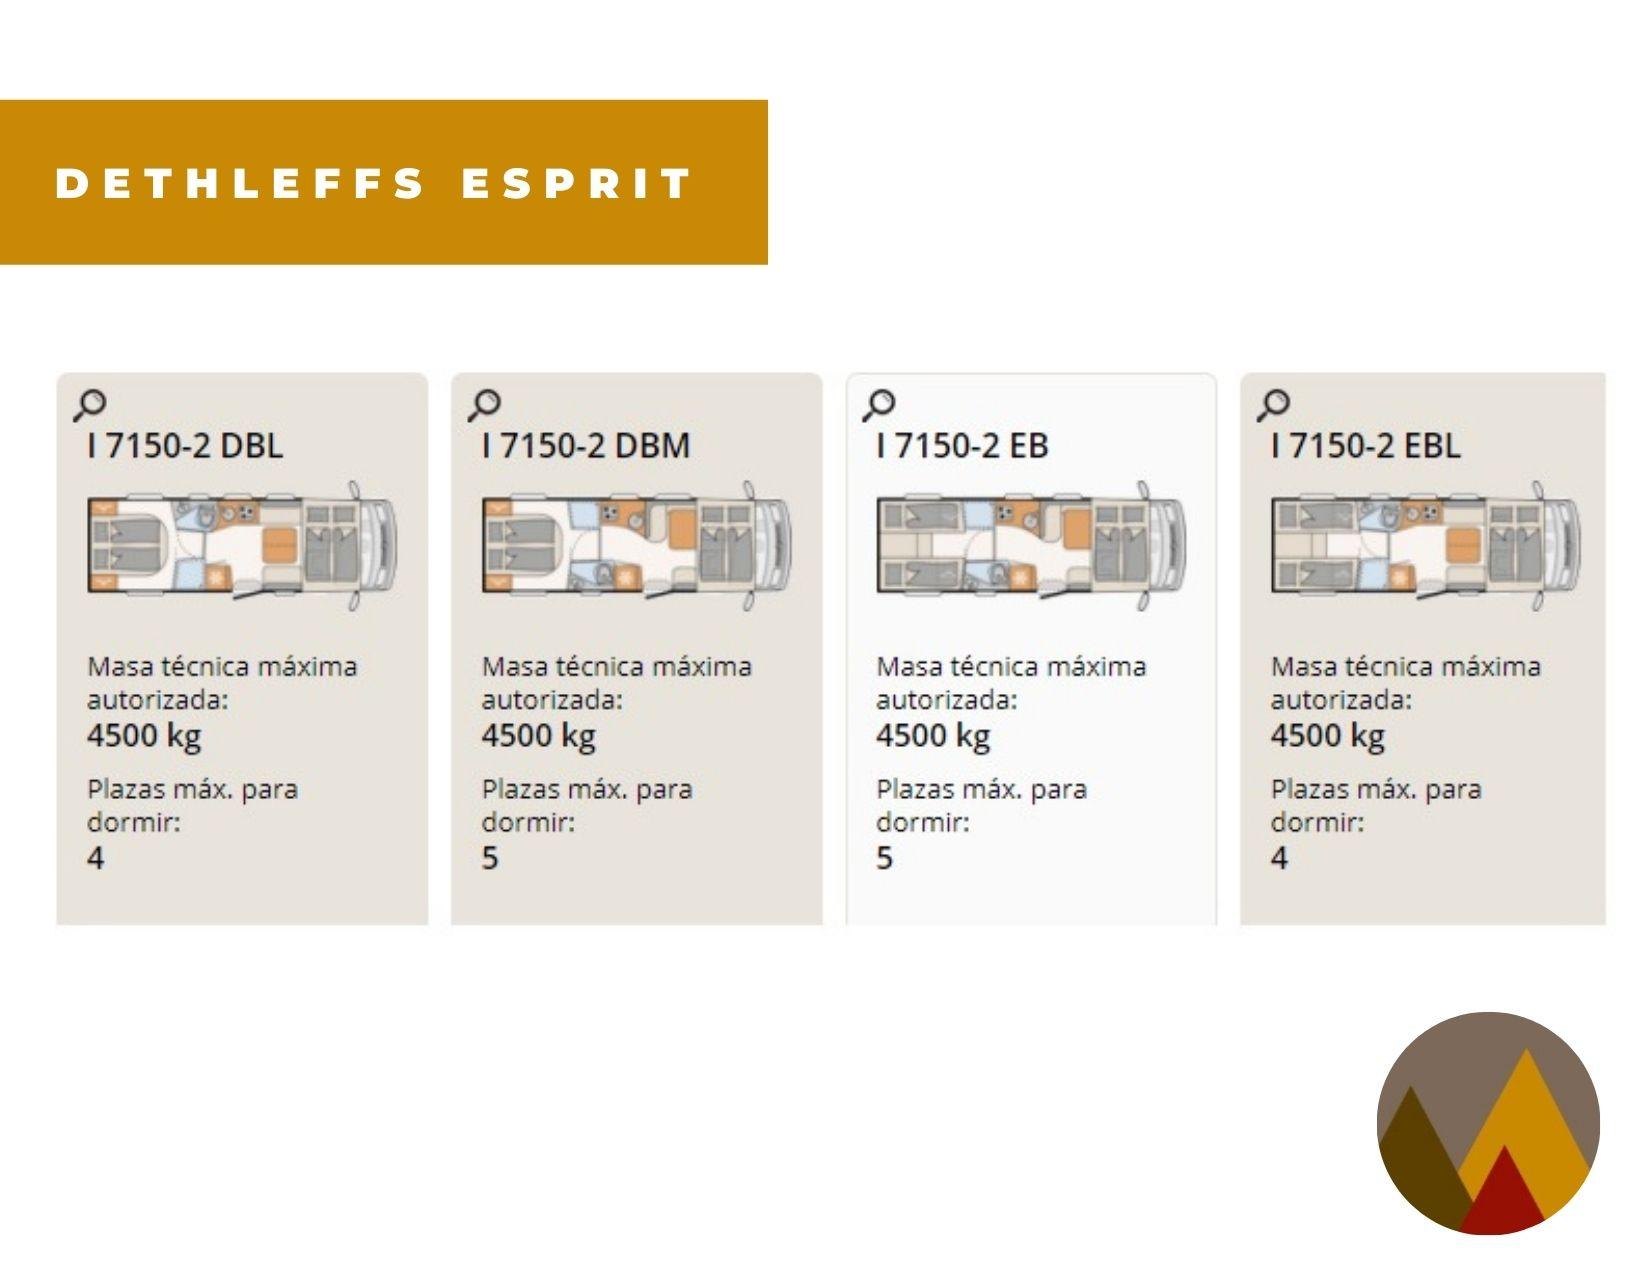 Dethleffs Esprit modelos